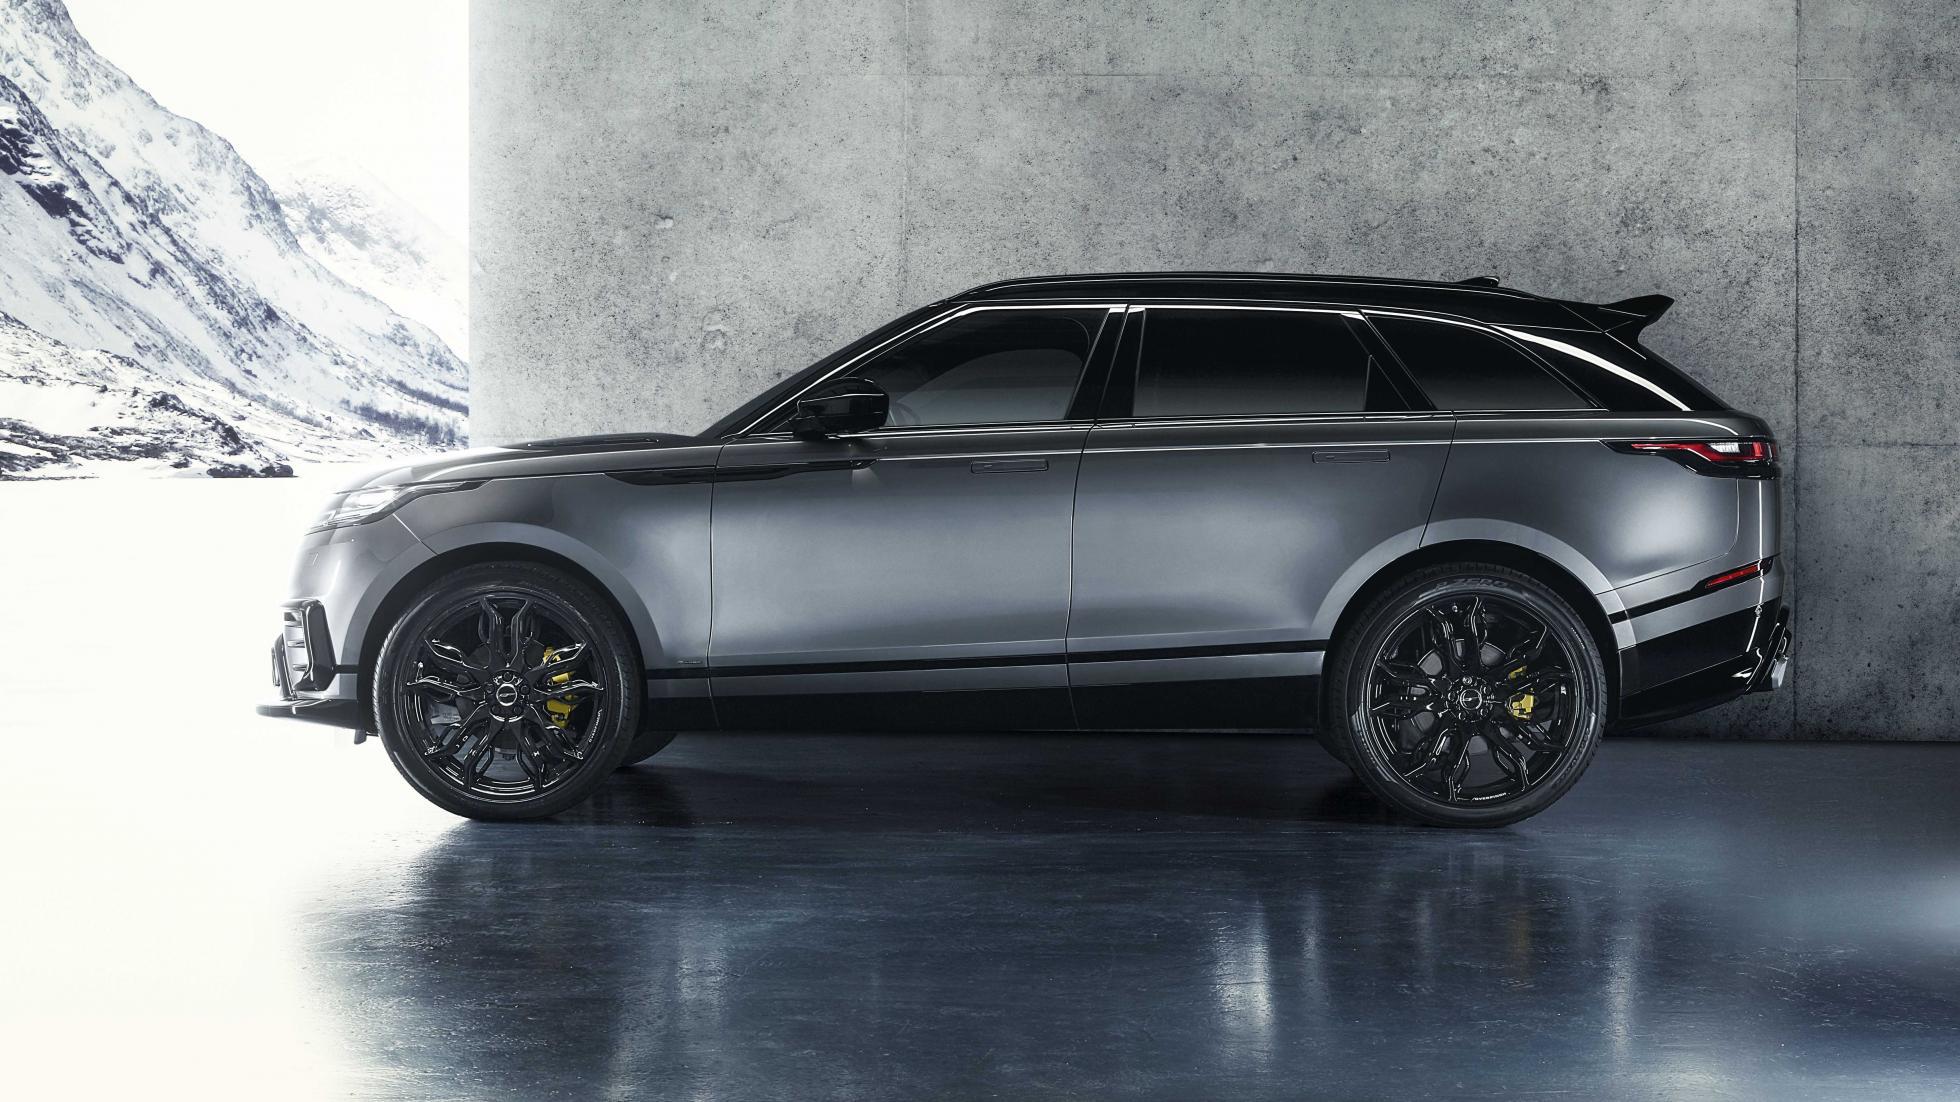 Range Rover Overfinch >> Waktunya Overfinch Memodifikasi Range Rover Velar